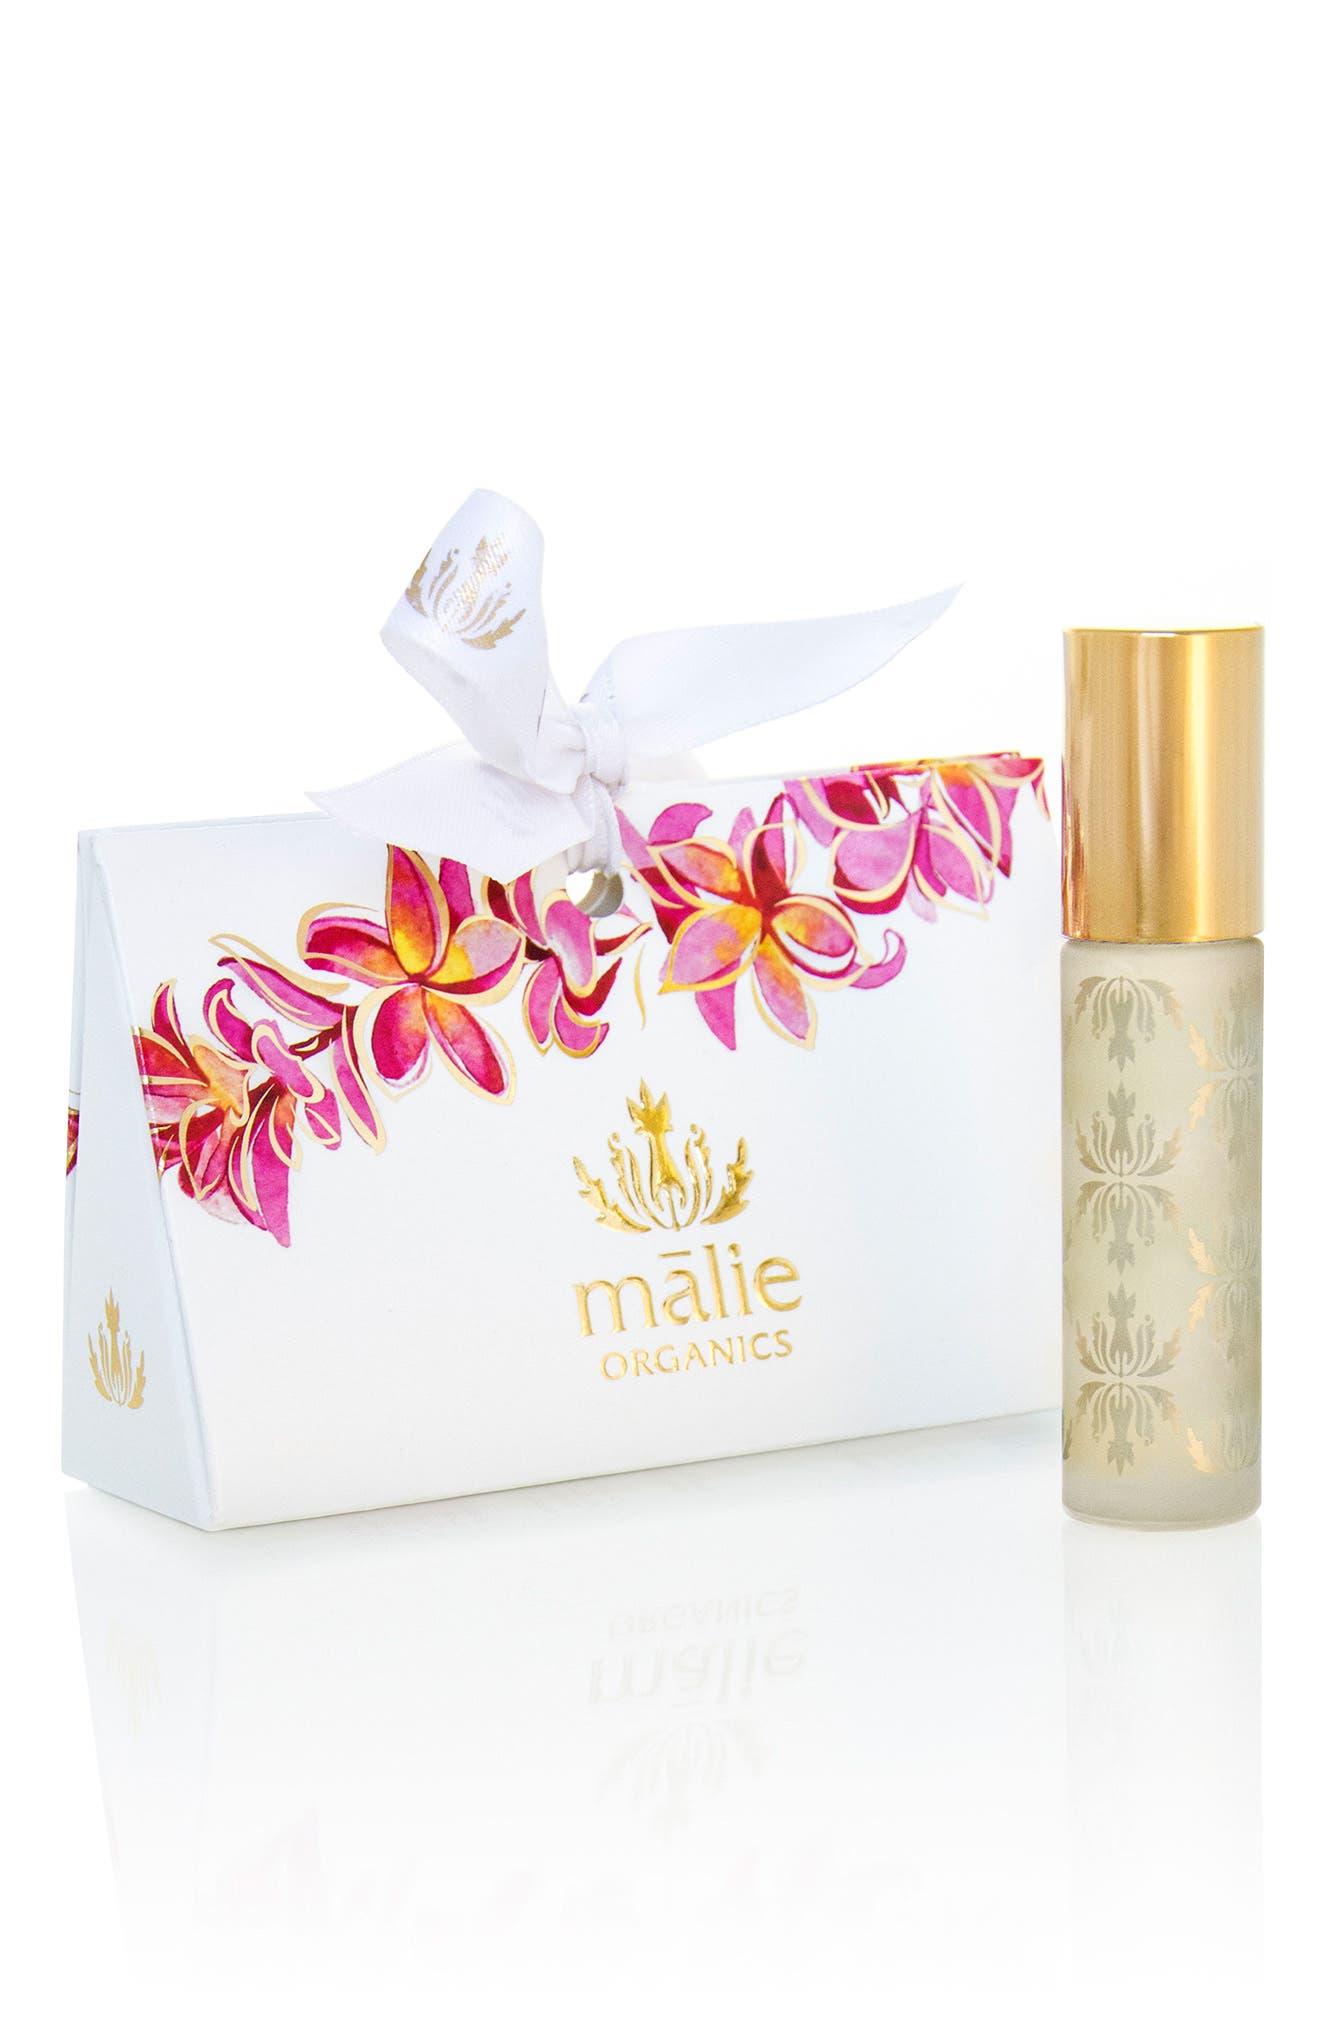 Plumeria Organic Roll-On Perfume Oil,                             Alternate thumbnail 2, color,